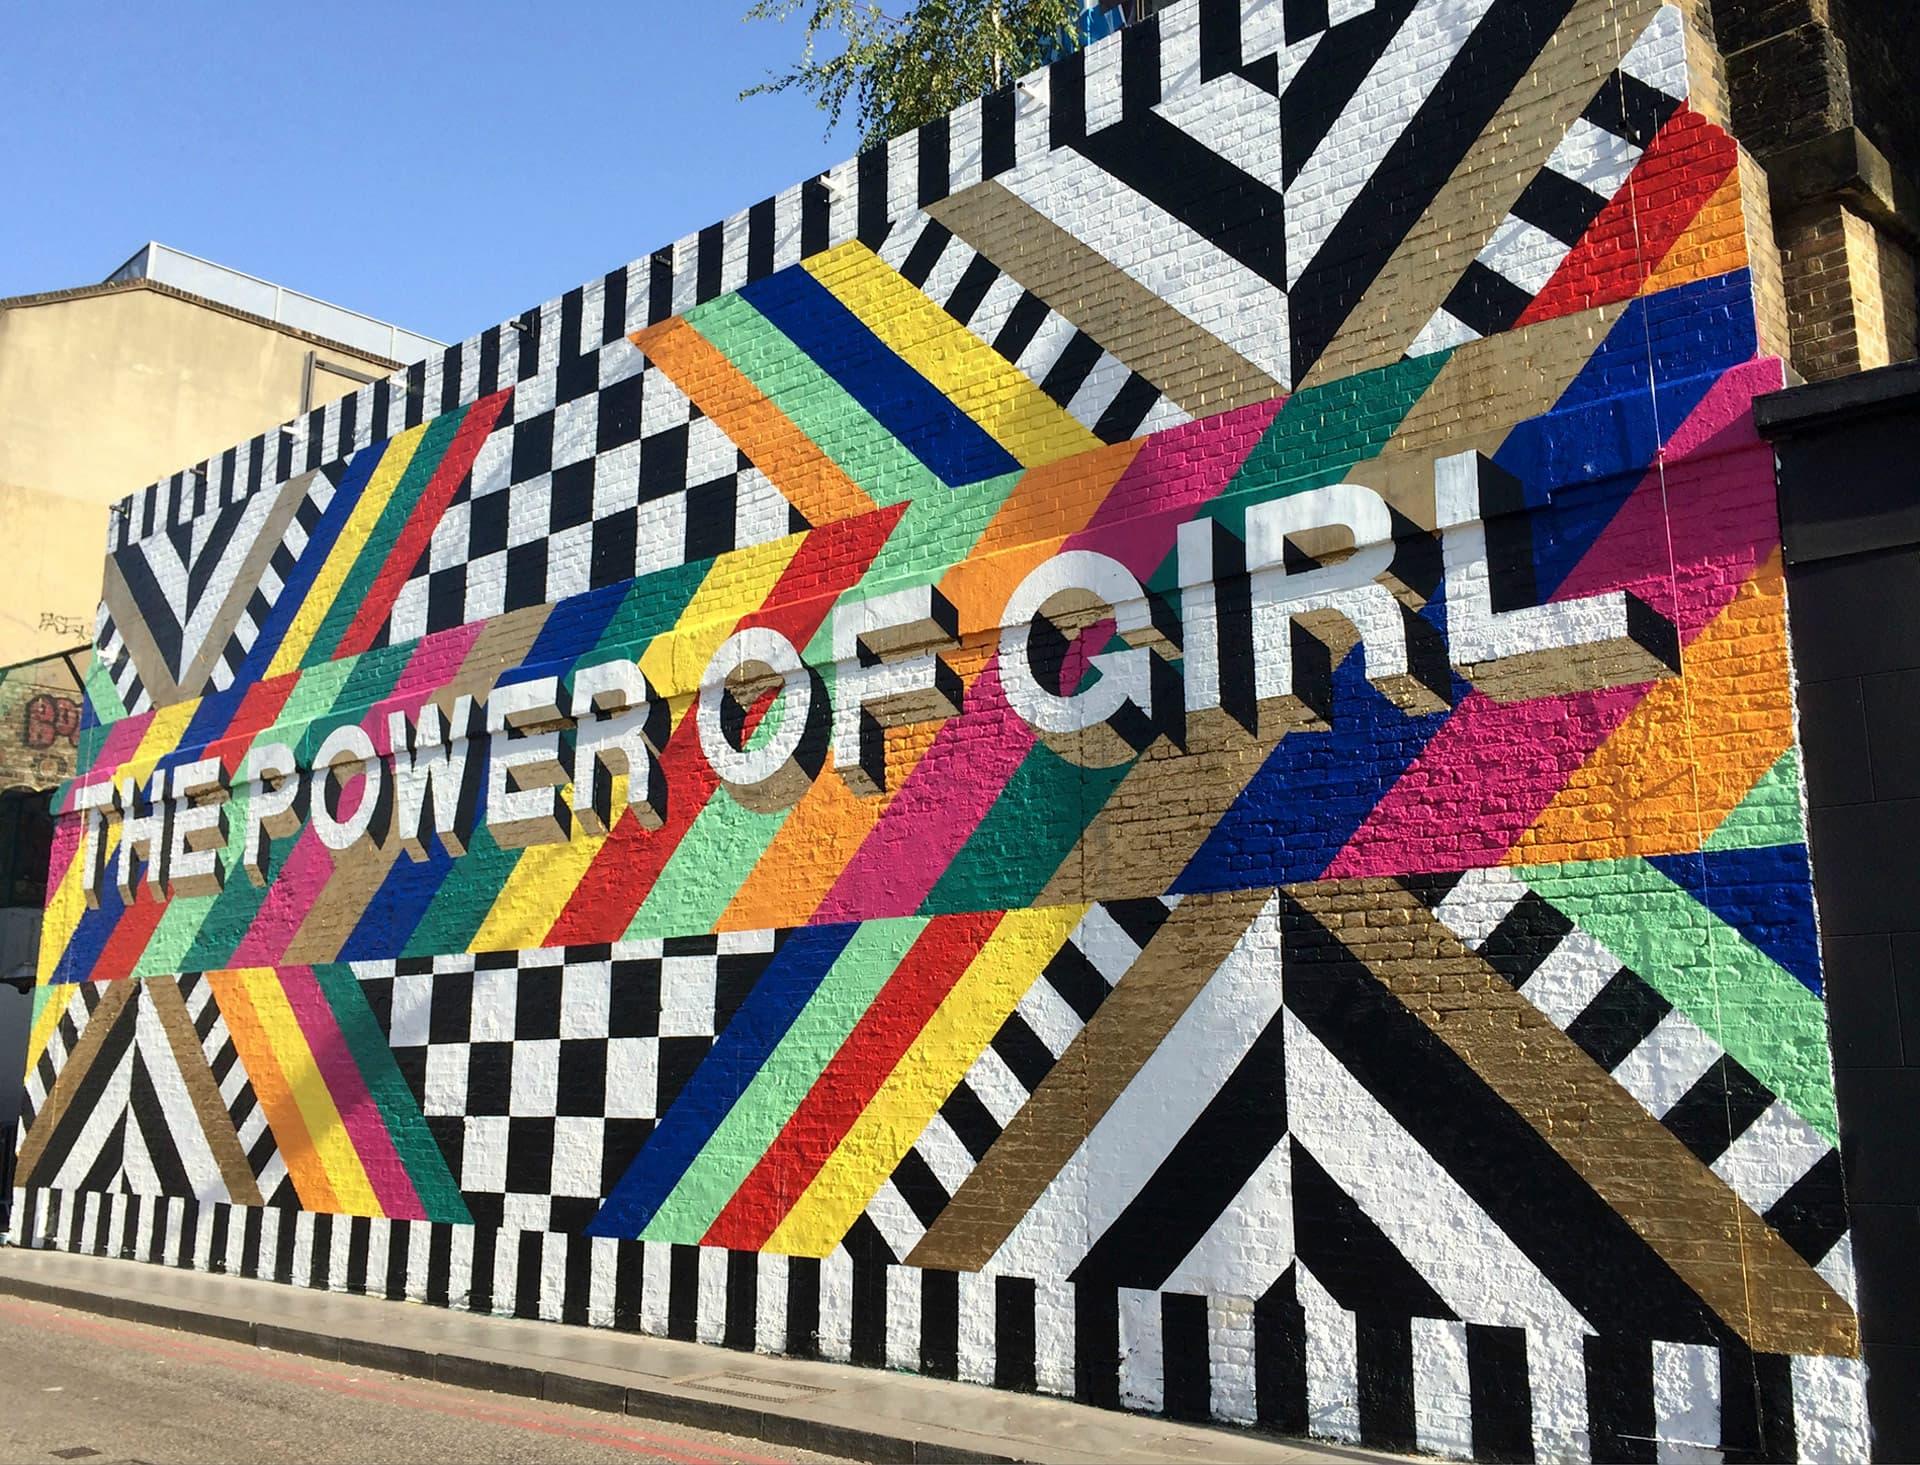 The power of girl, 2014